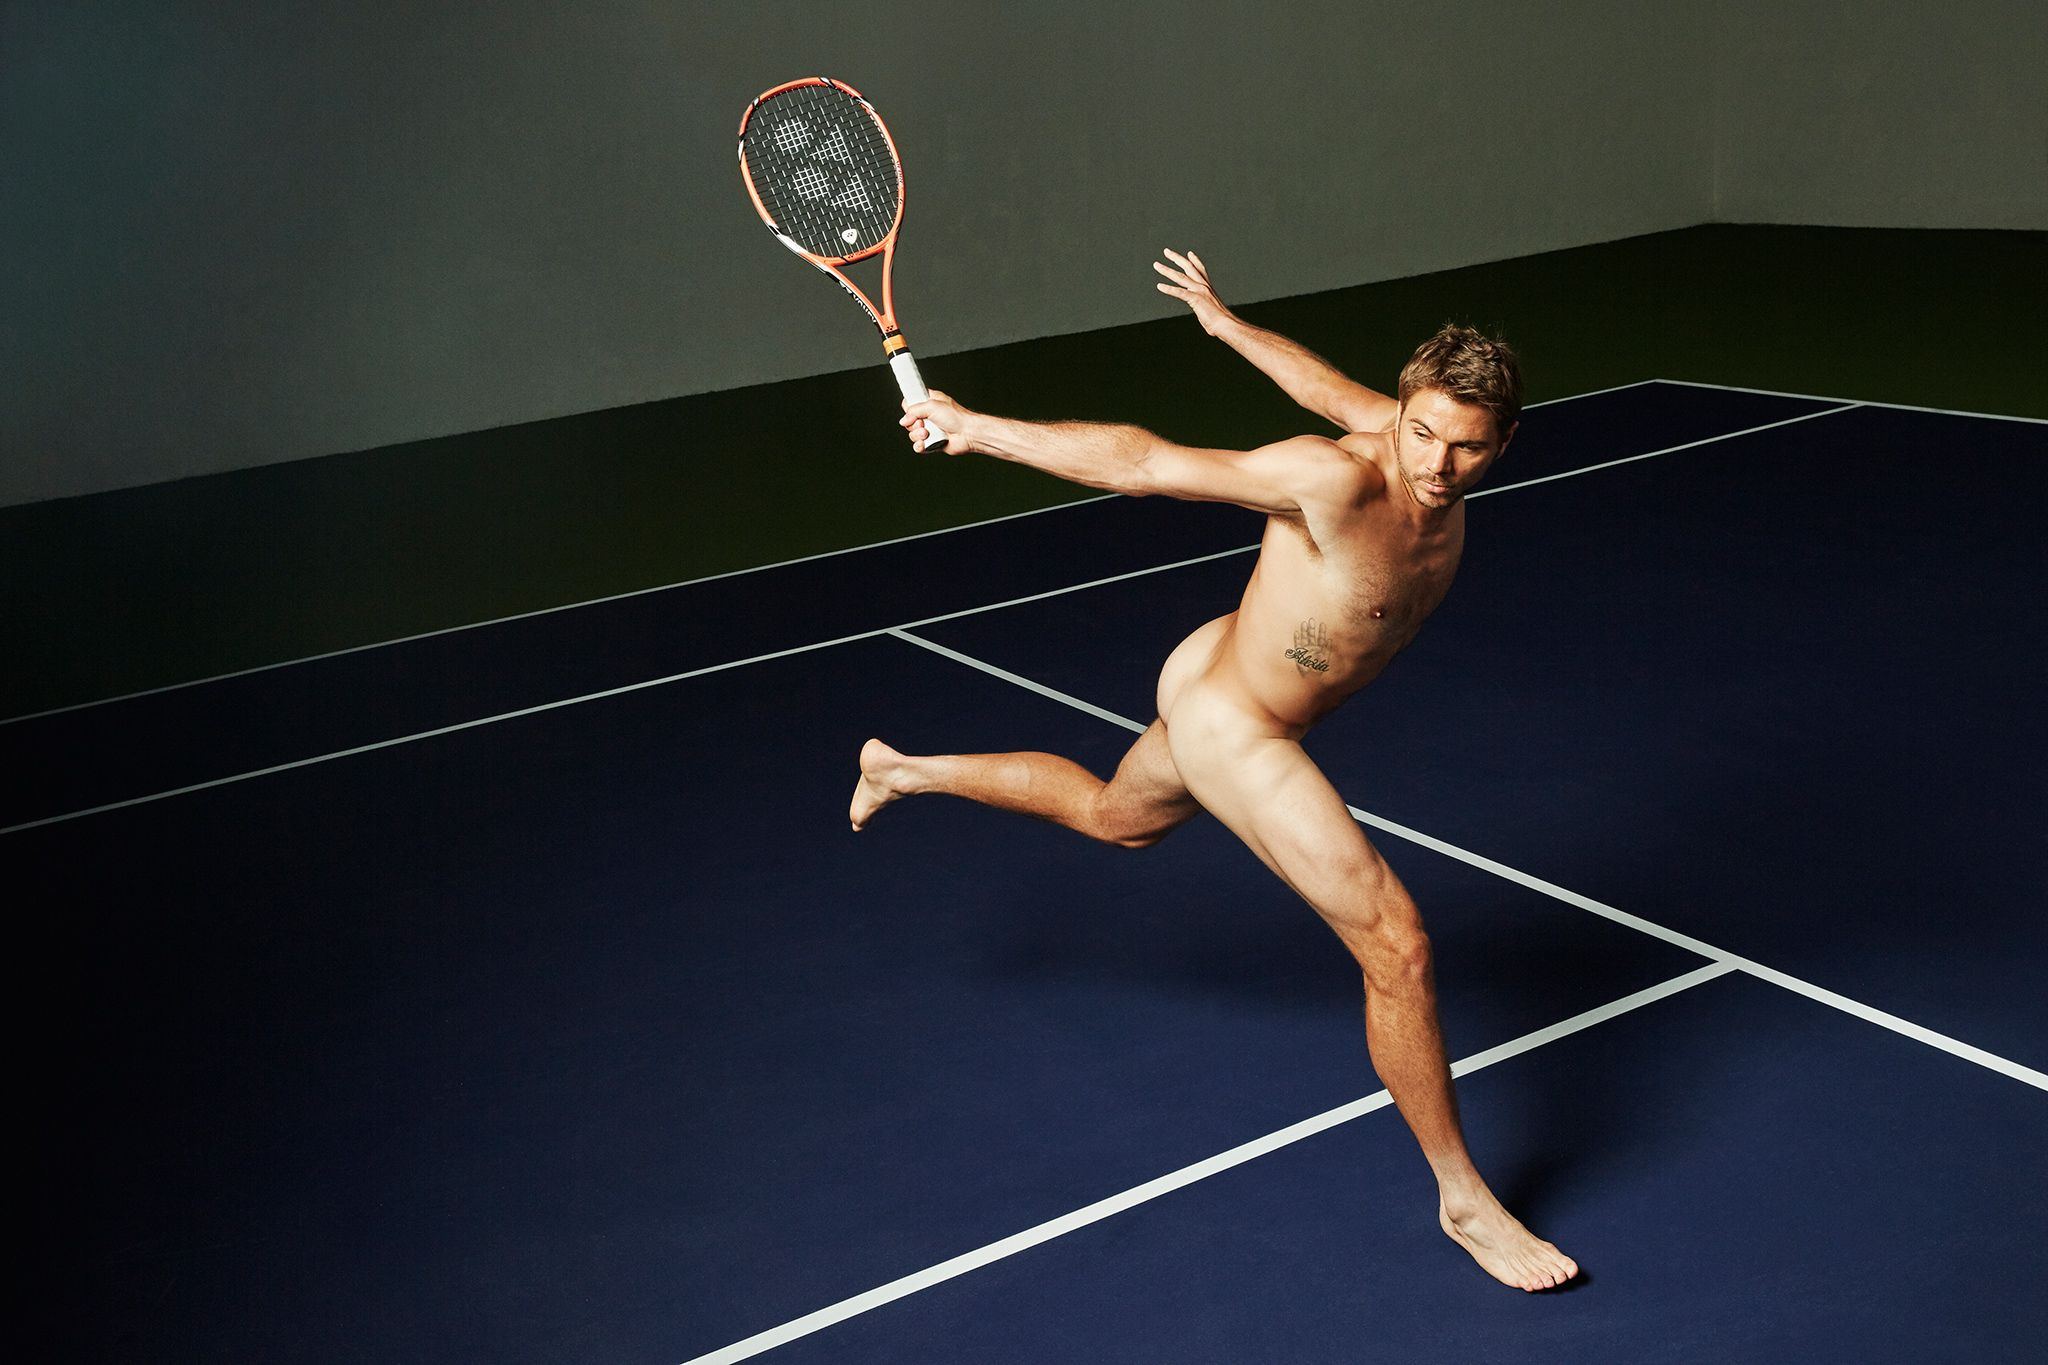 Mens tennis naked